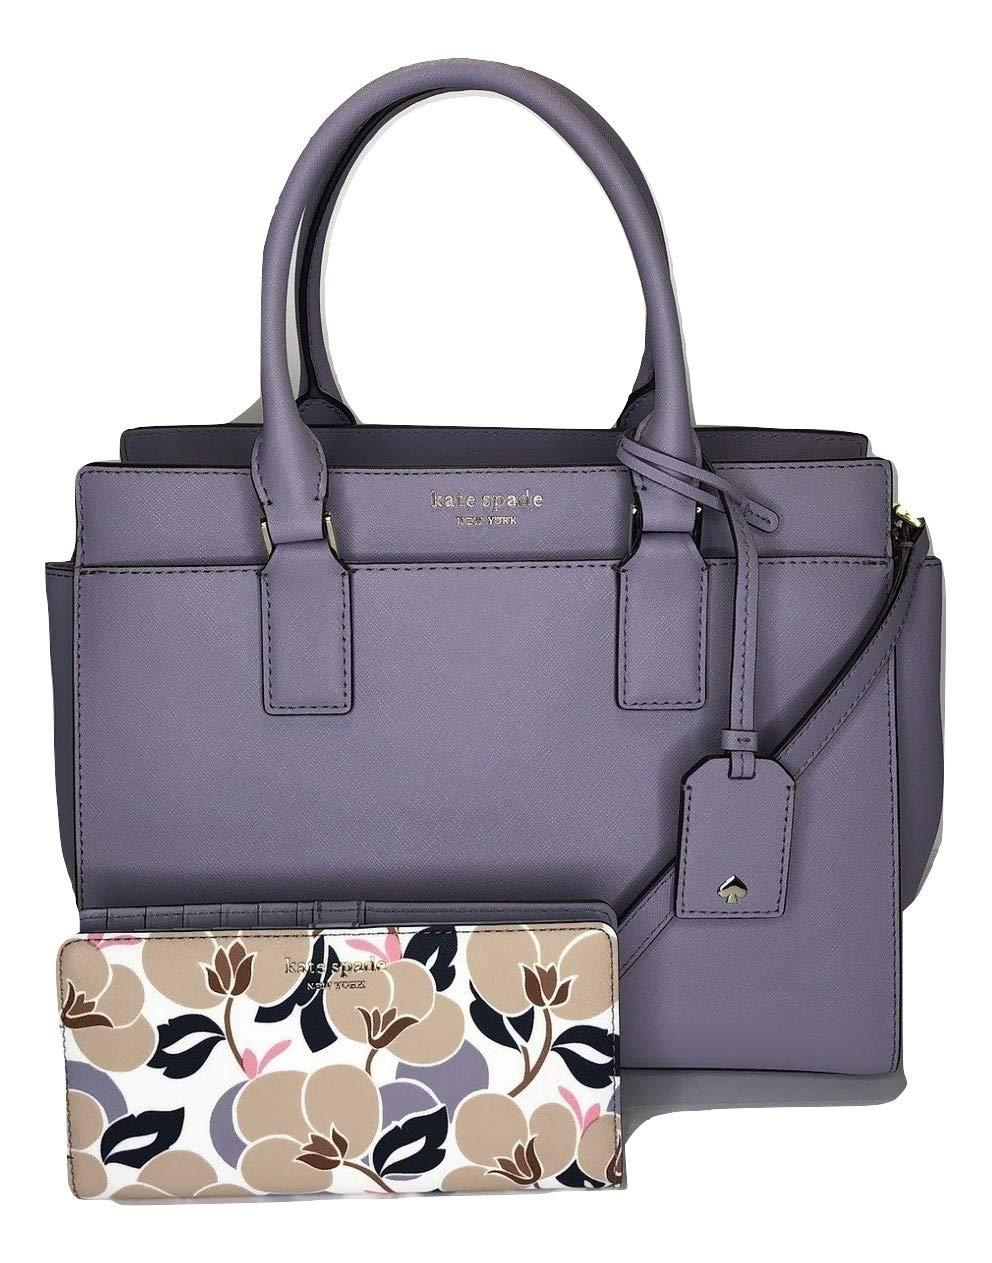 Kate Spade New York Cameron Medium Satchel WKRU5851 bundled with matching Wallet WLRU5418 (Icy Lavender/Breezy Floral)